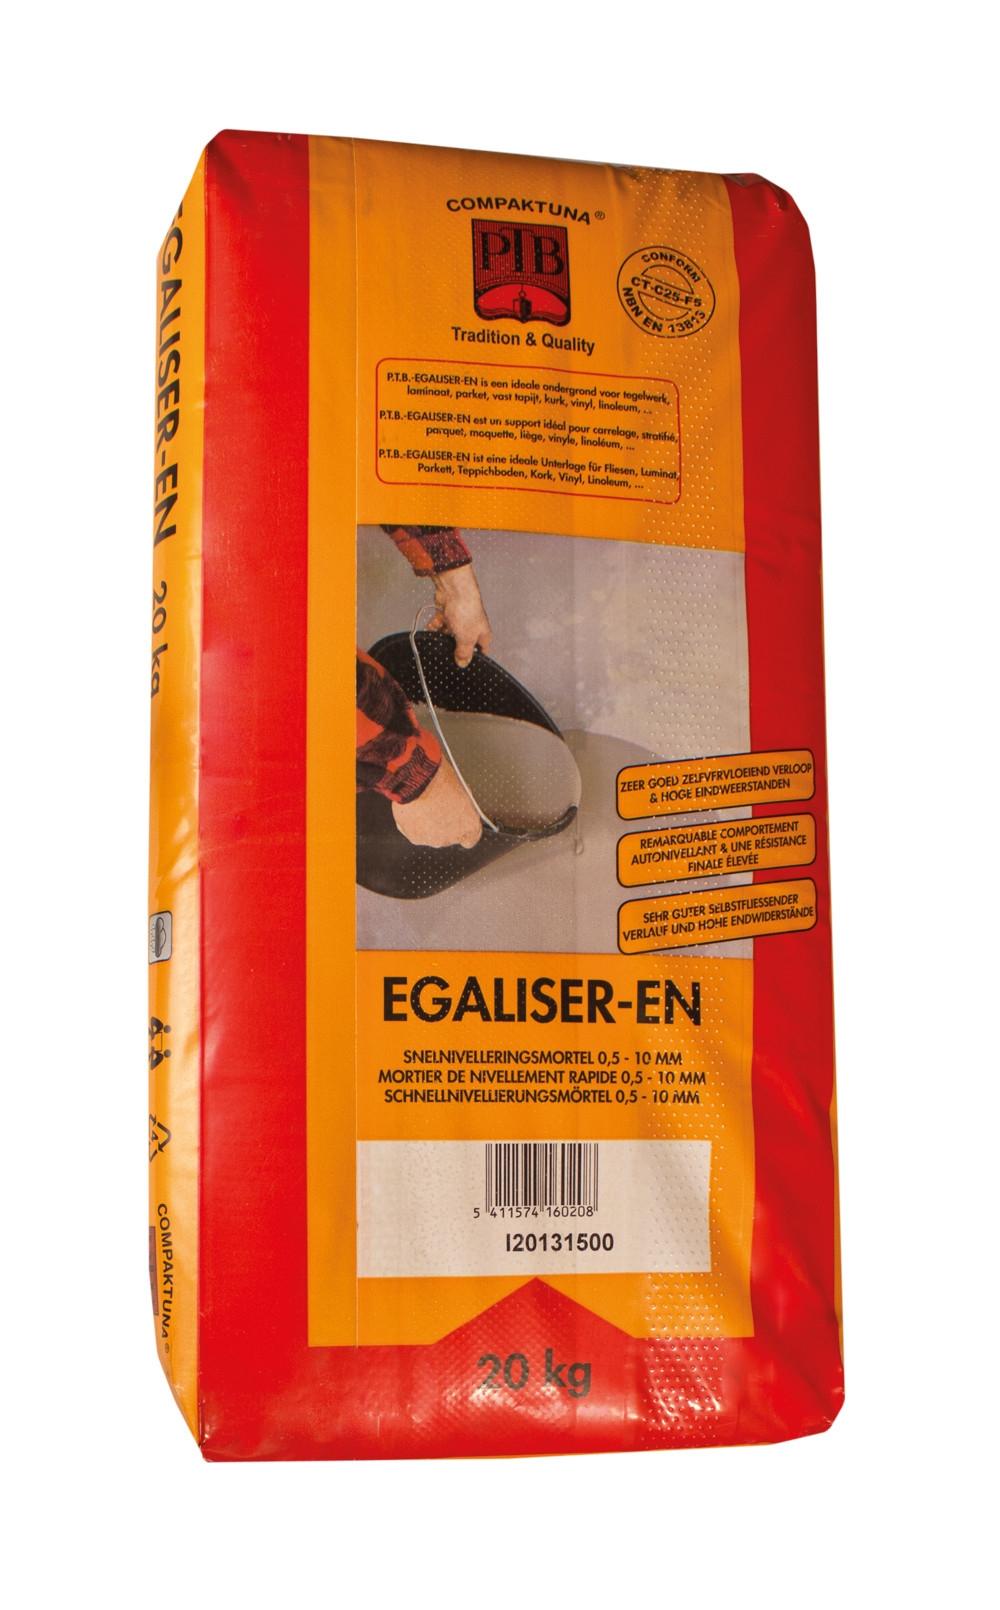 Egaliser-en - 20kg - Grijs